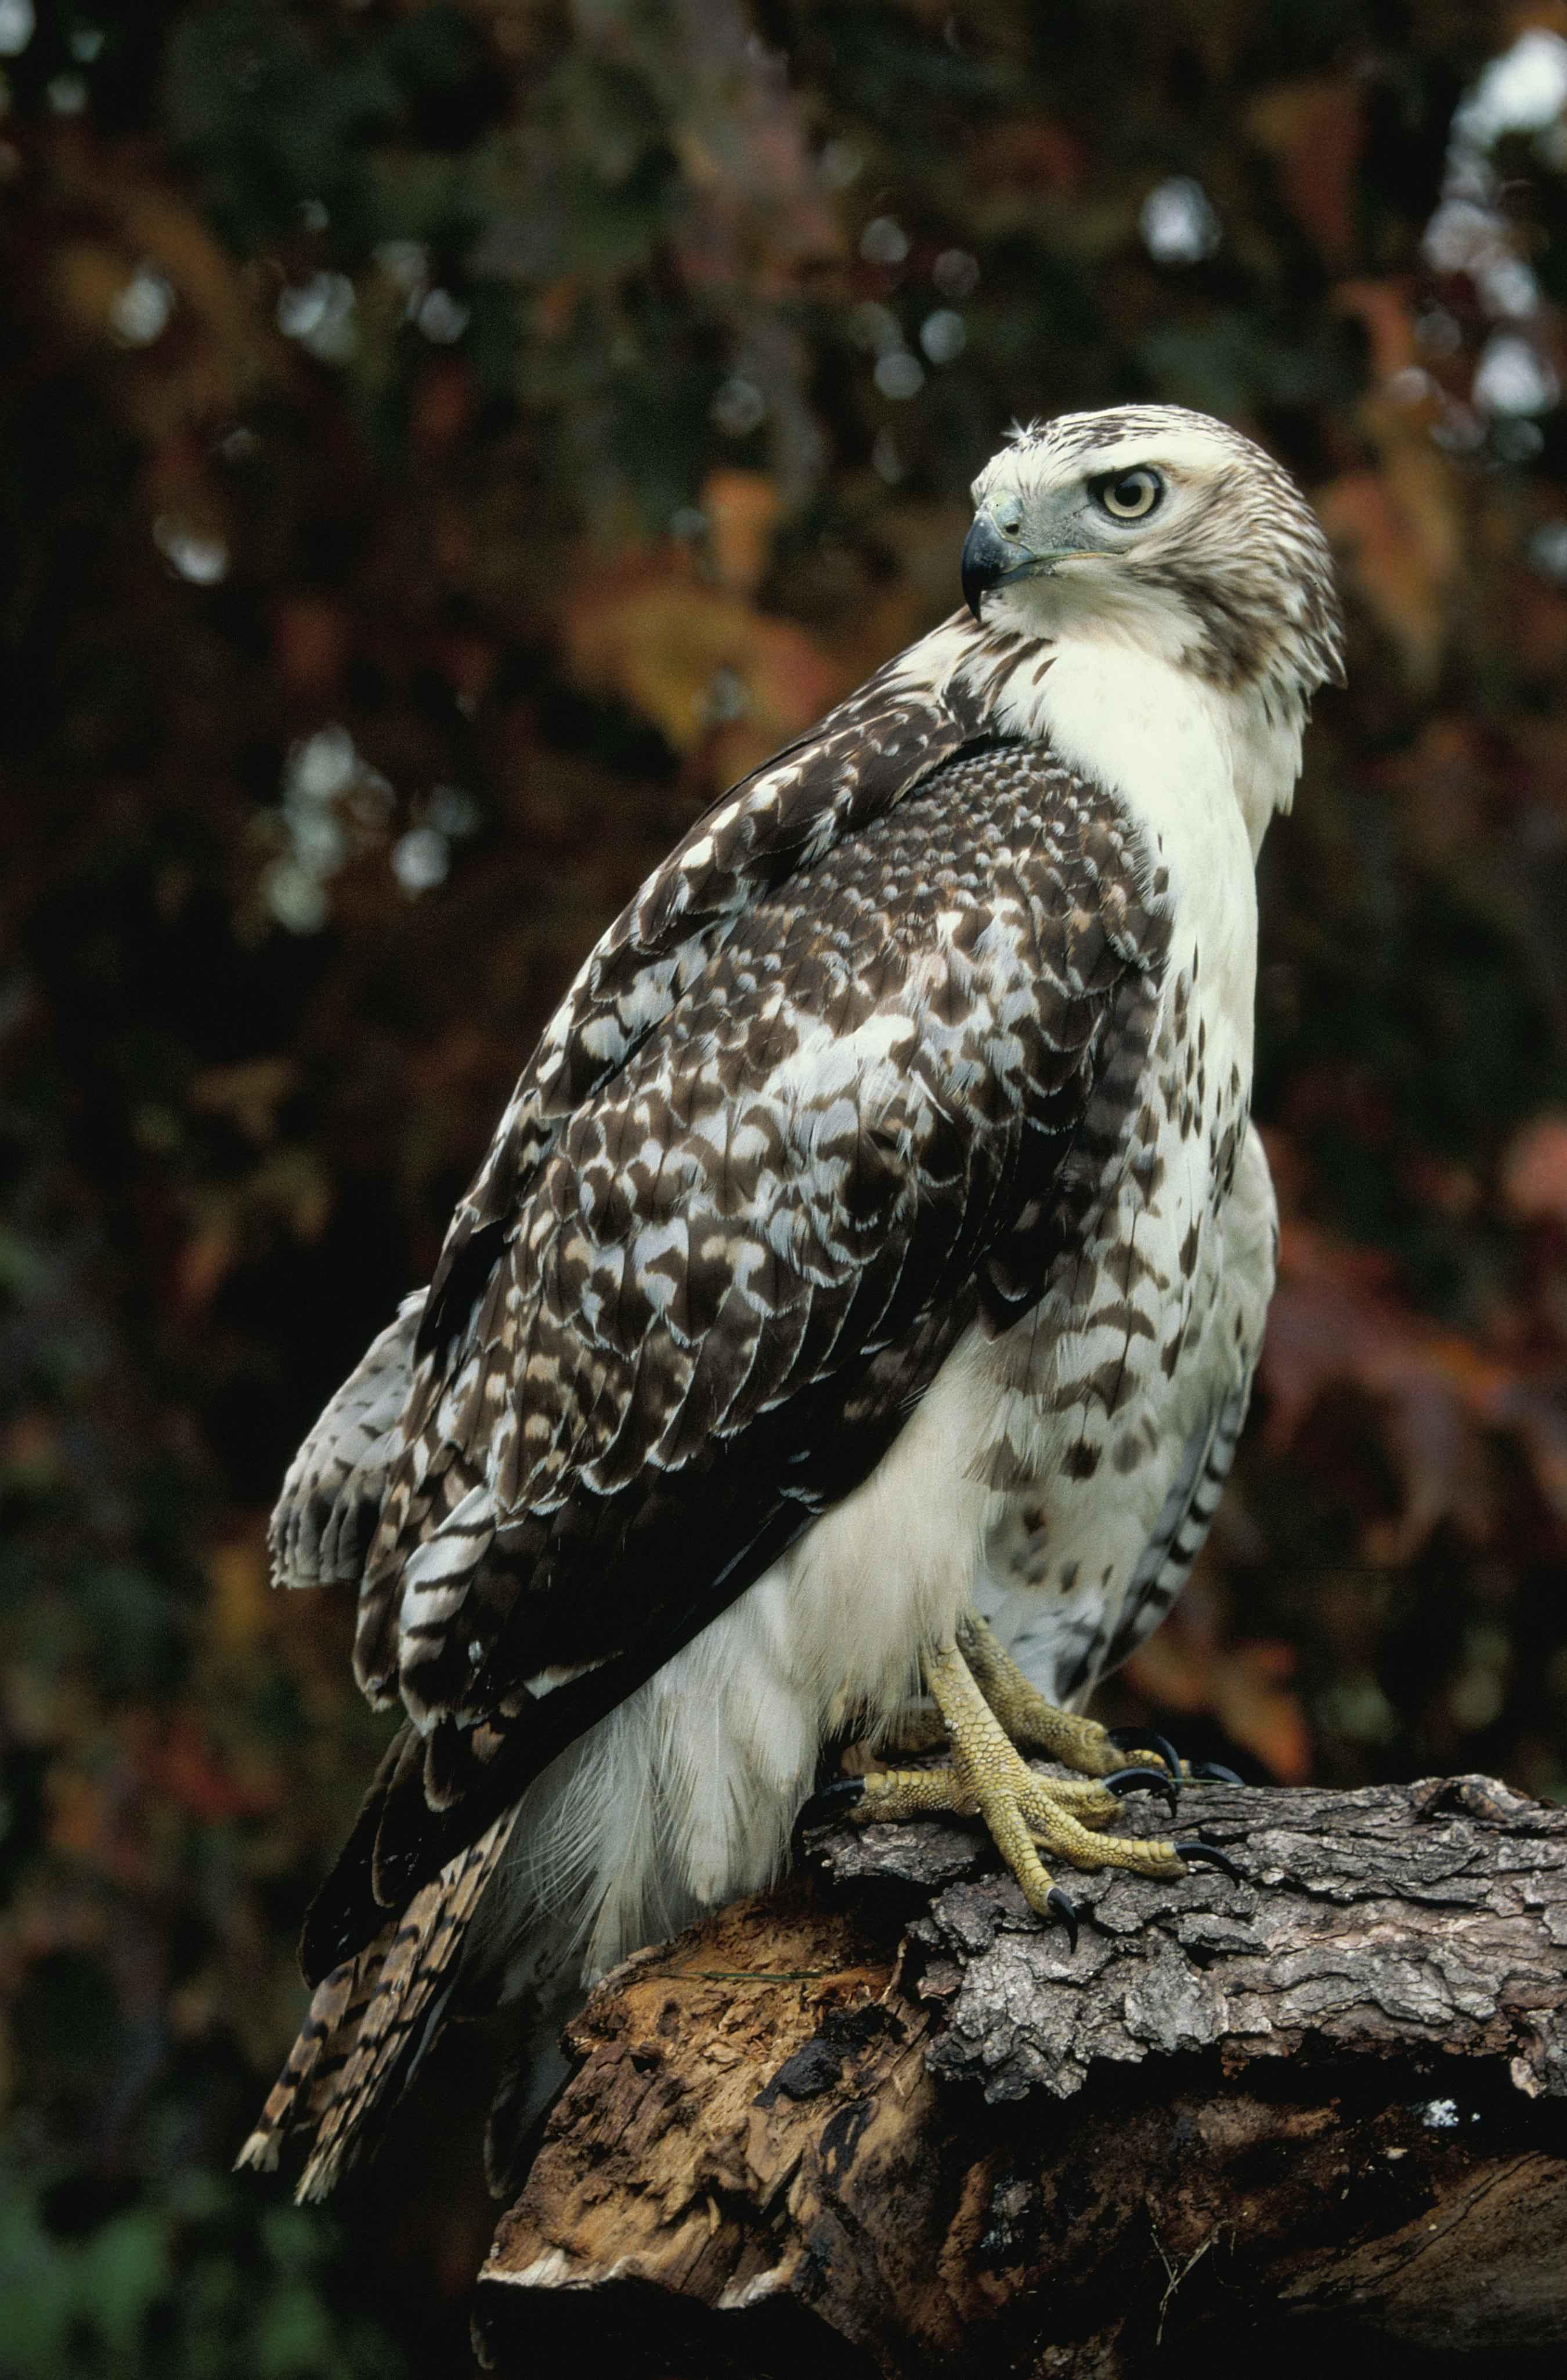 Bird Wing Wildlife Standing Log Red Beak Hawk Owl Fauna Of Prey Birds Animals Vertebrate